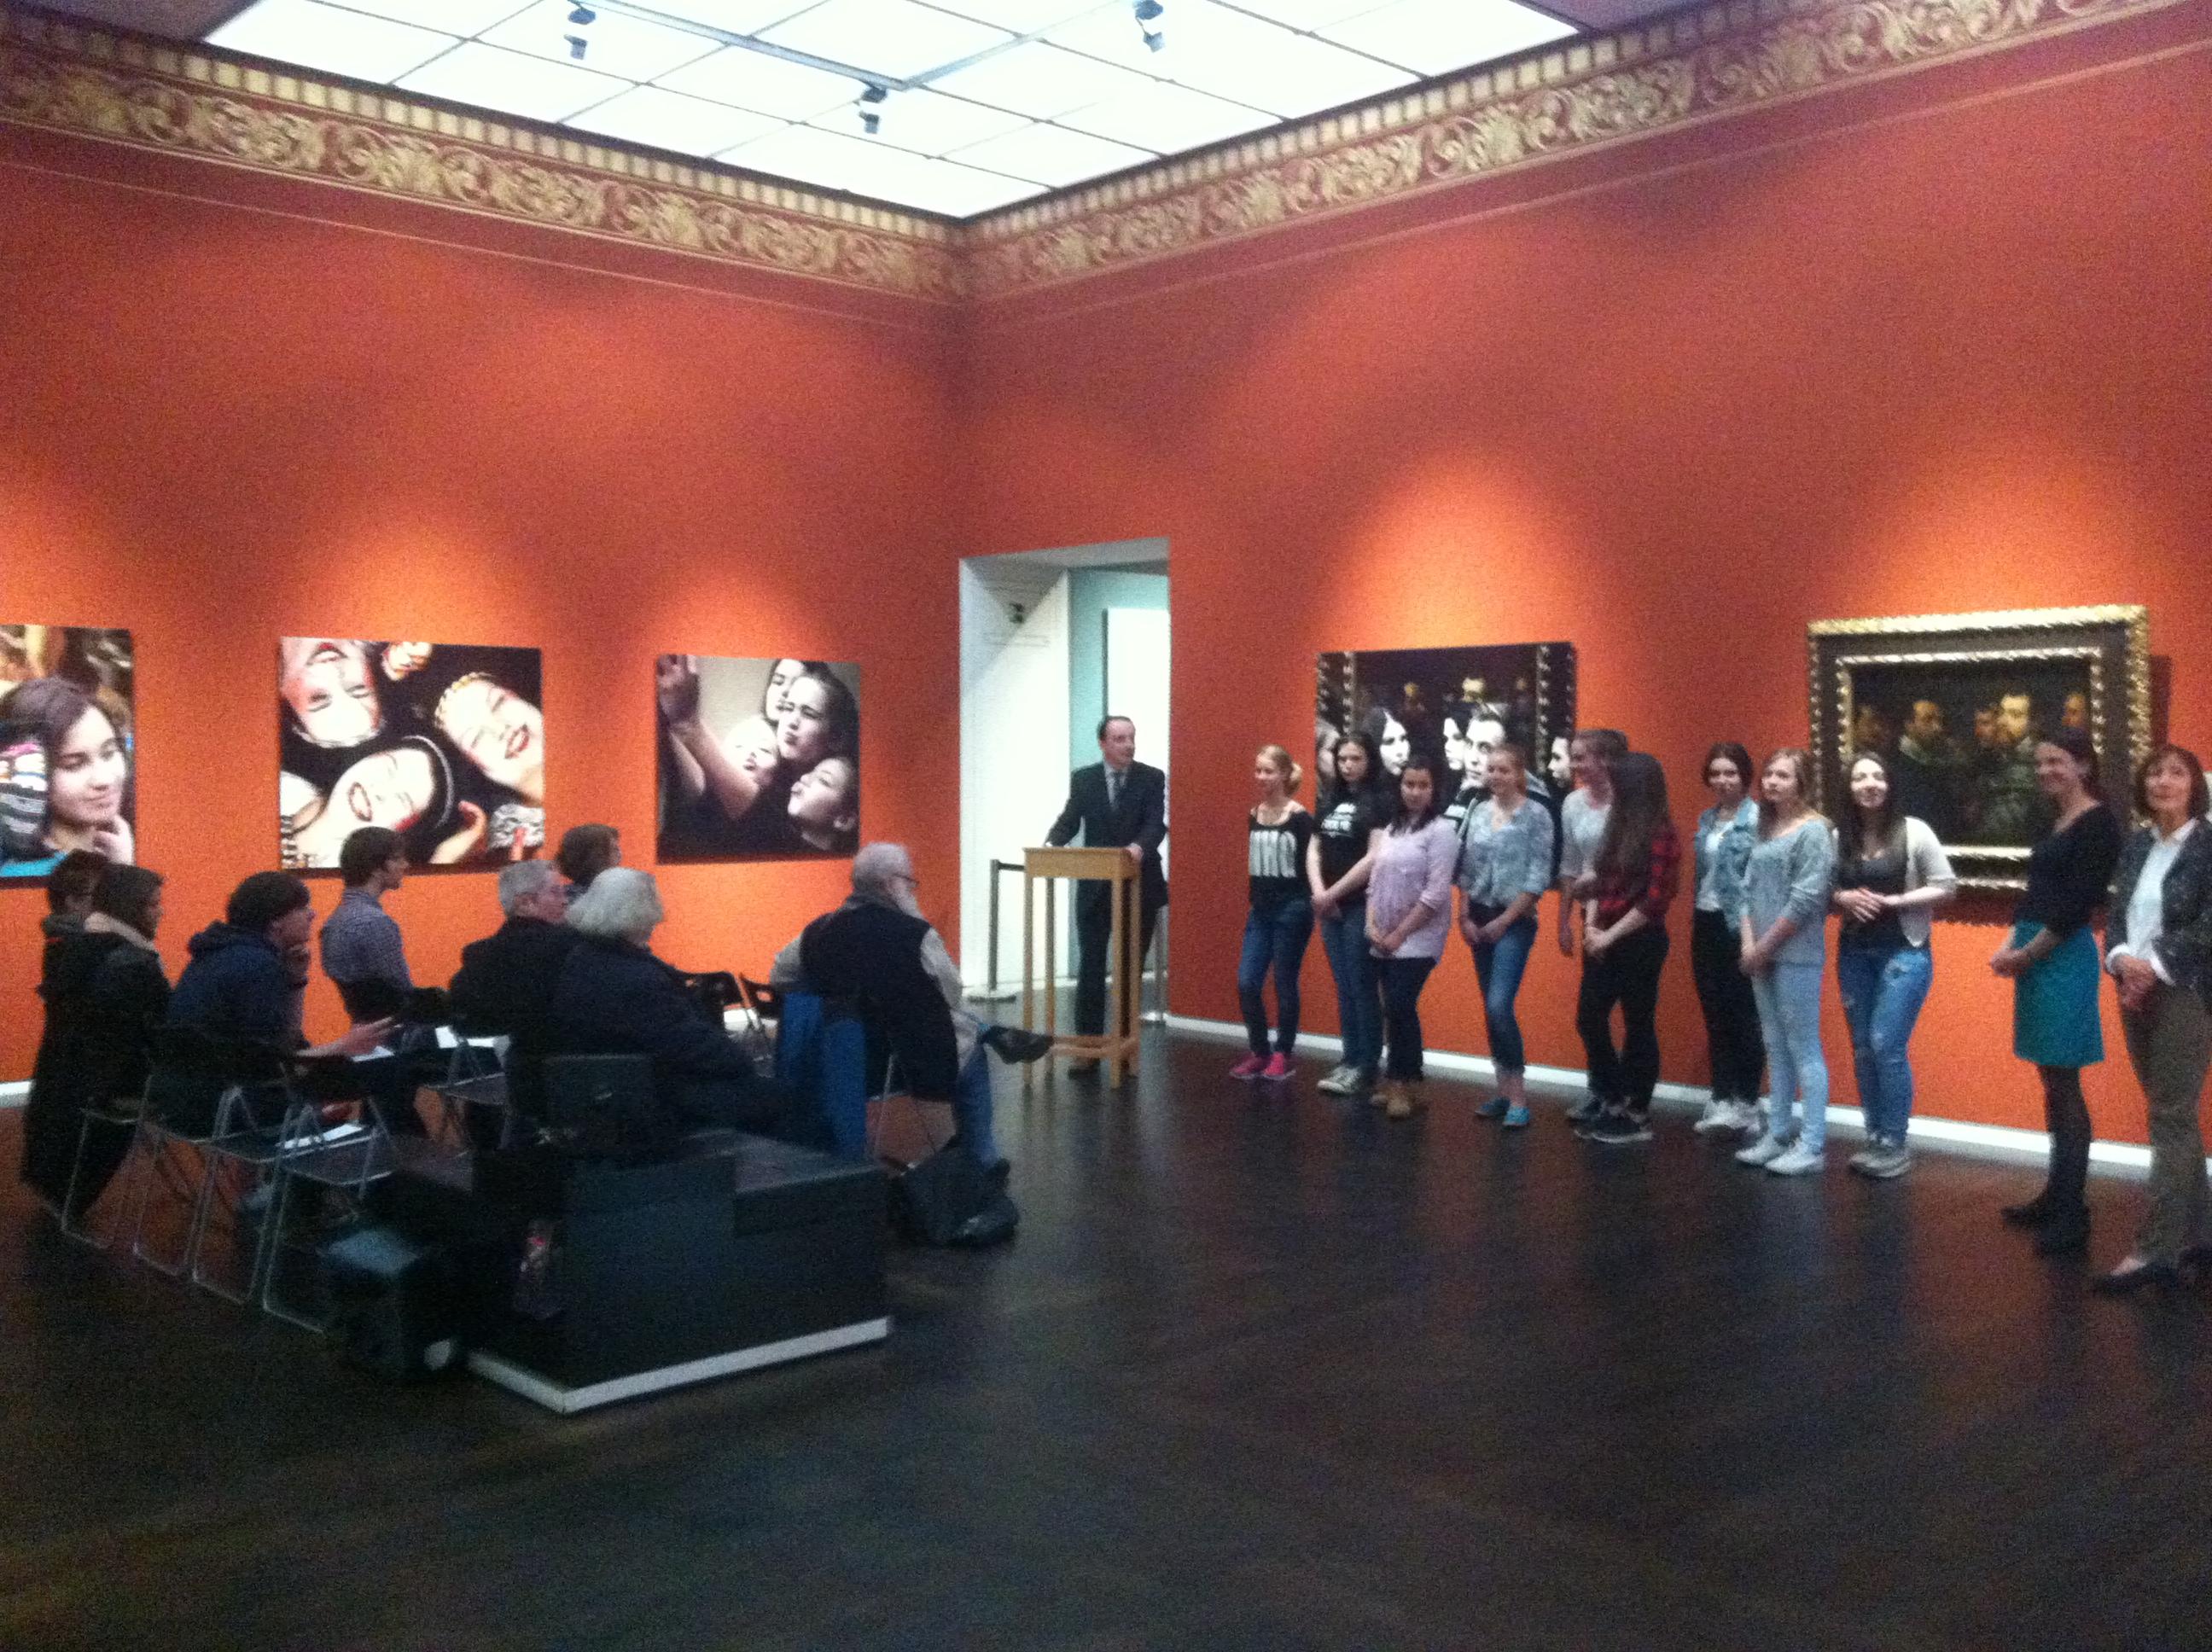 Museumsdirektor Dekiert begrüßt die Teilnehmer